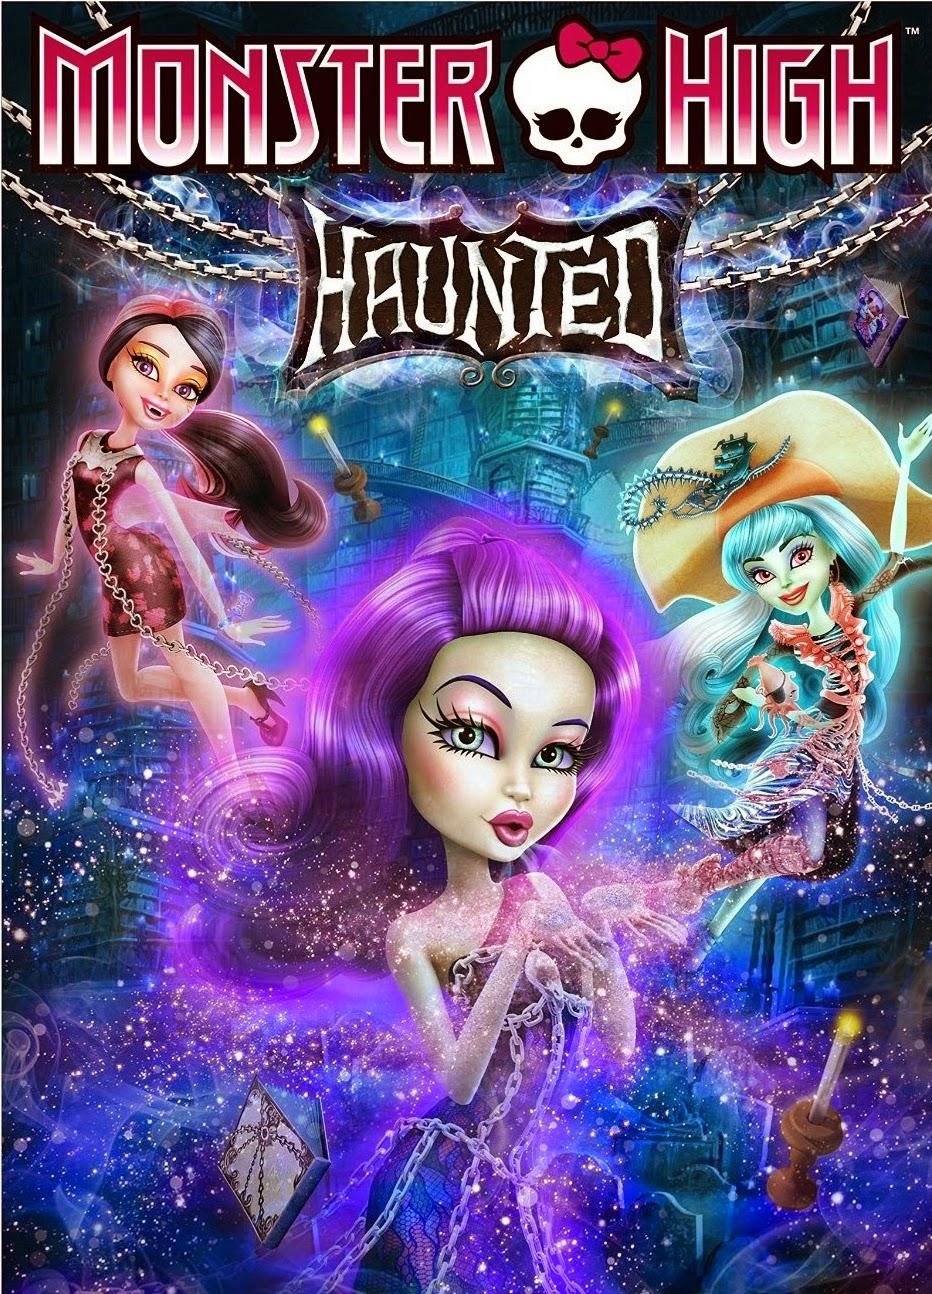 Monster High Haunted มอนสเตอร์ ไฮ หลอน [HD][พากย์ไทย]